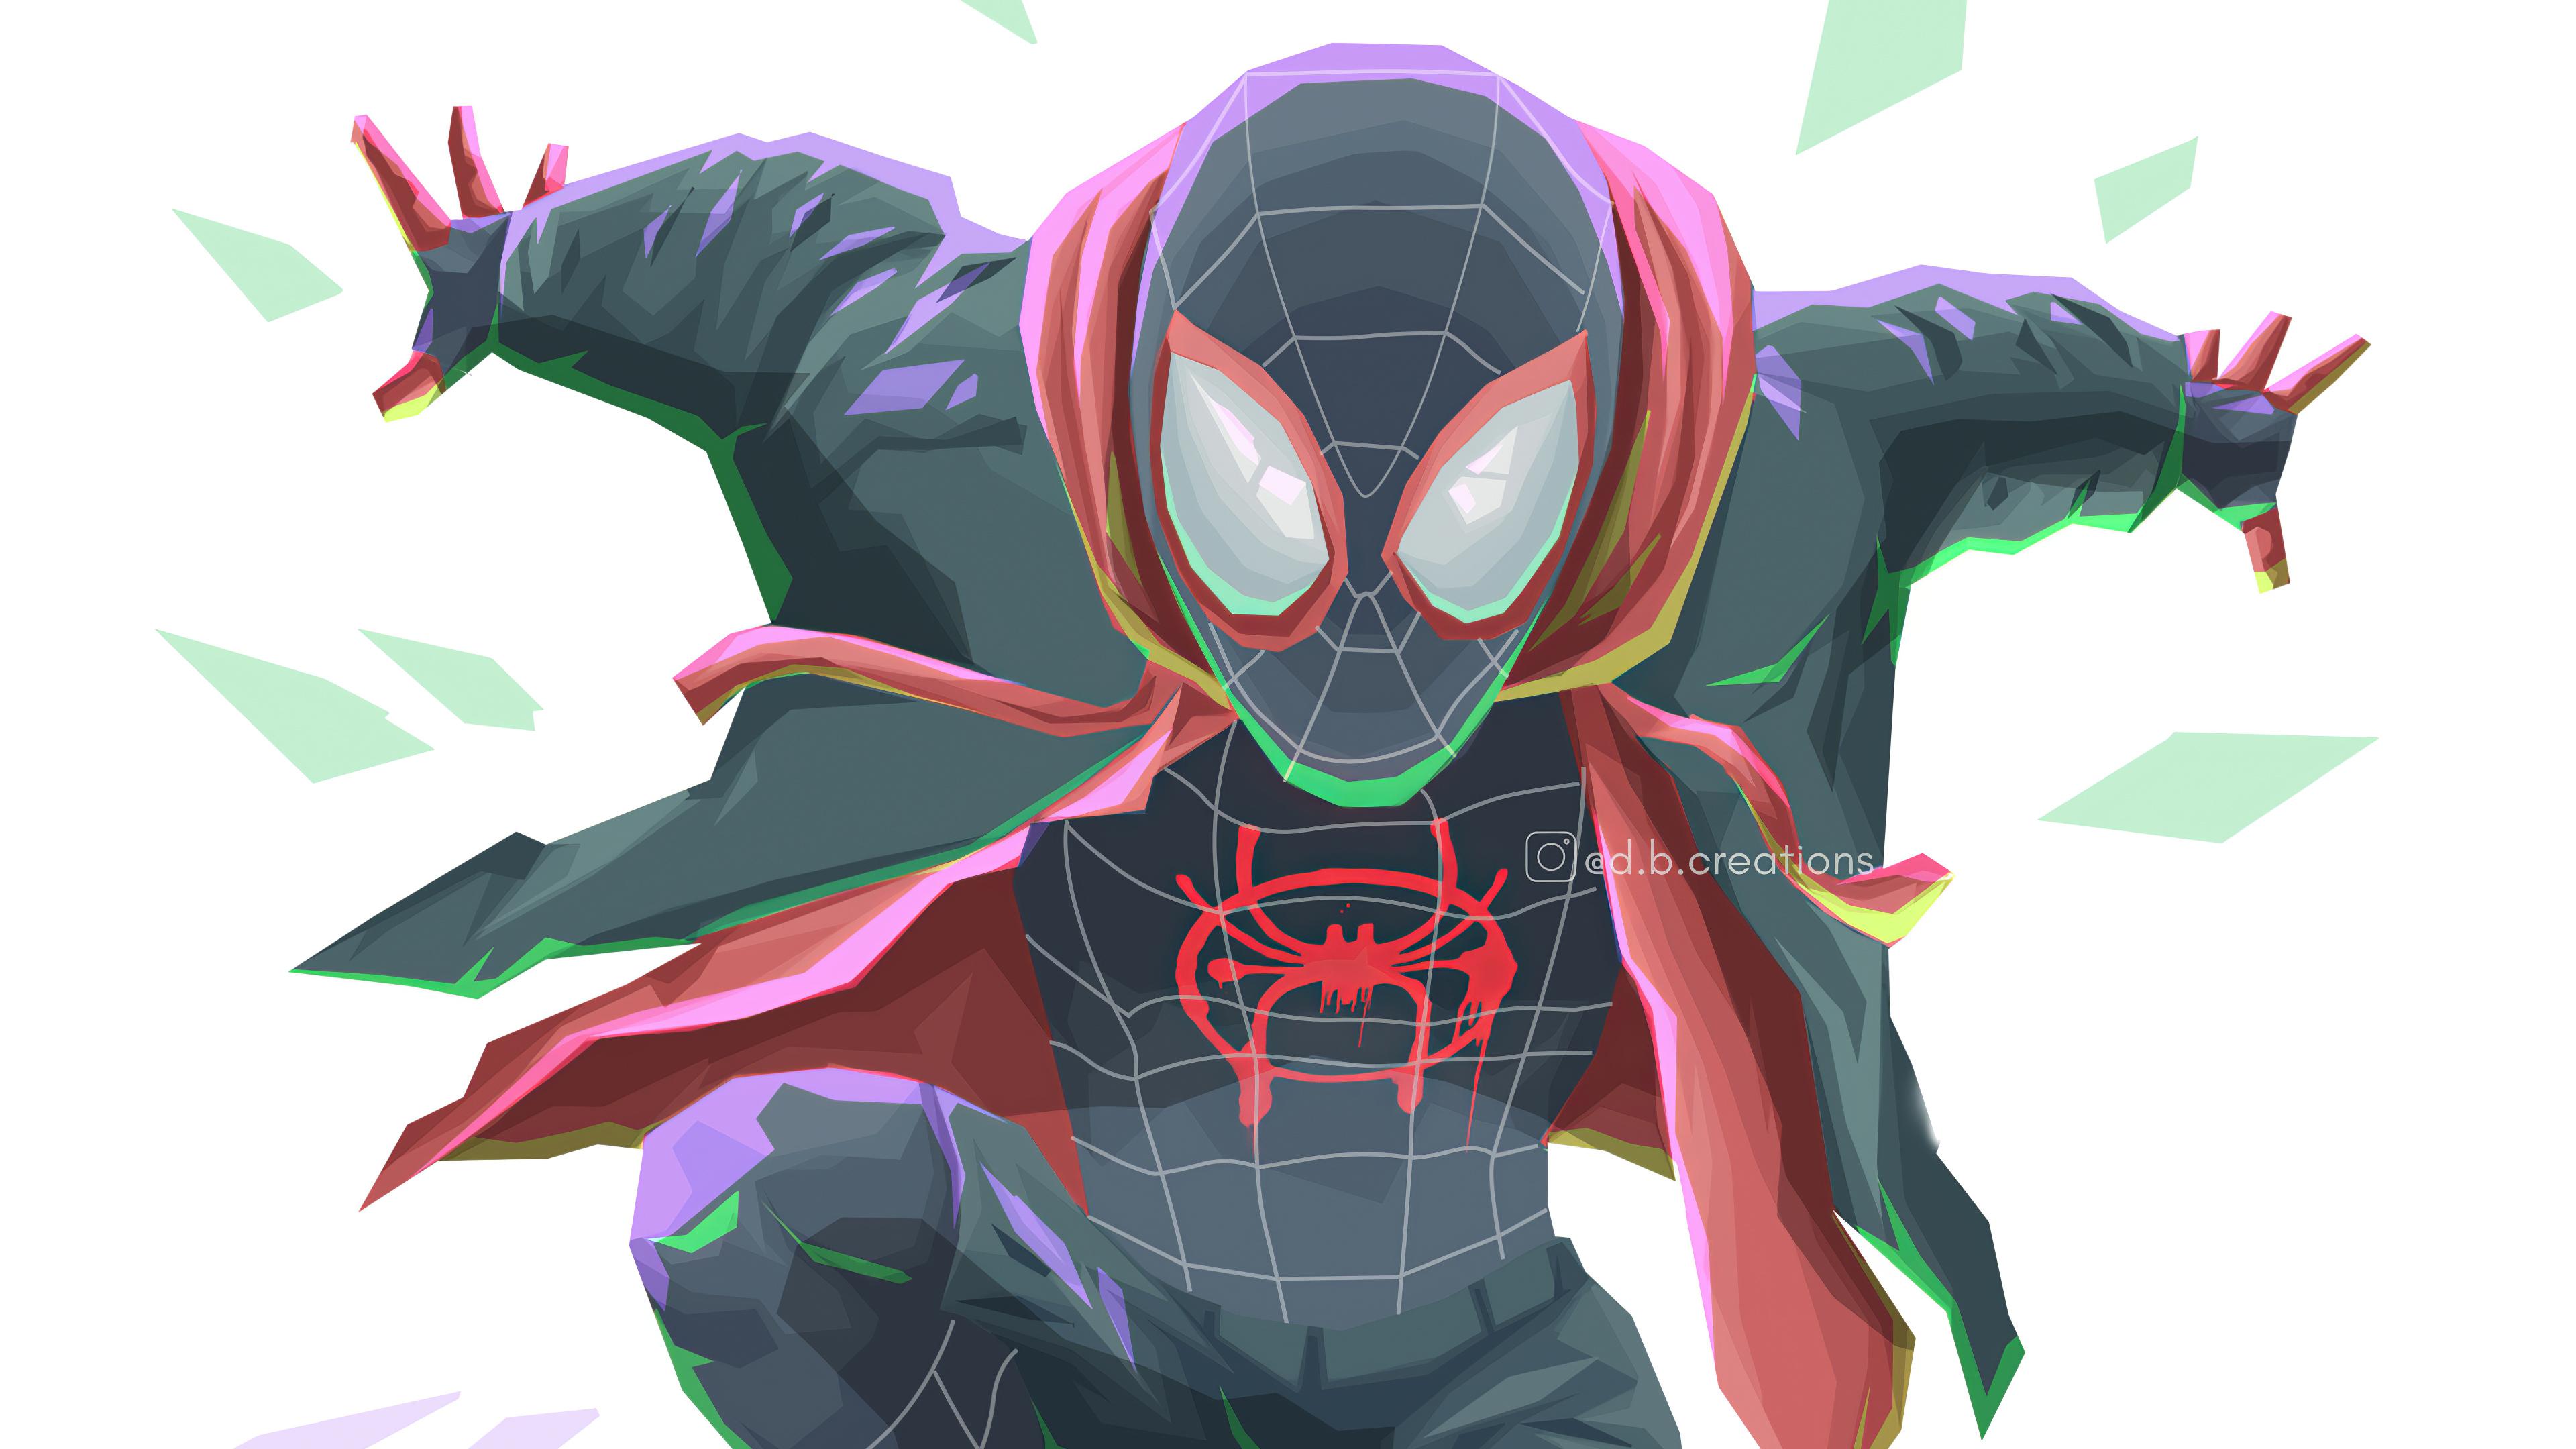 spiderverse miles morales art 1576091861 - Spiderverse Miles Morales Art - Spiderverse Miles Morales wallpaper 4k, 4k Spiderverse Miles Morales wallpaper phone 4k